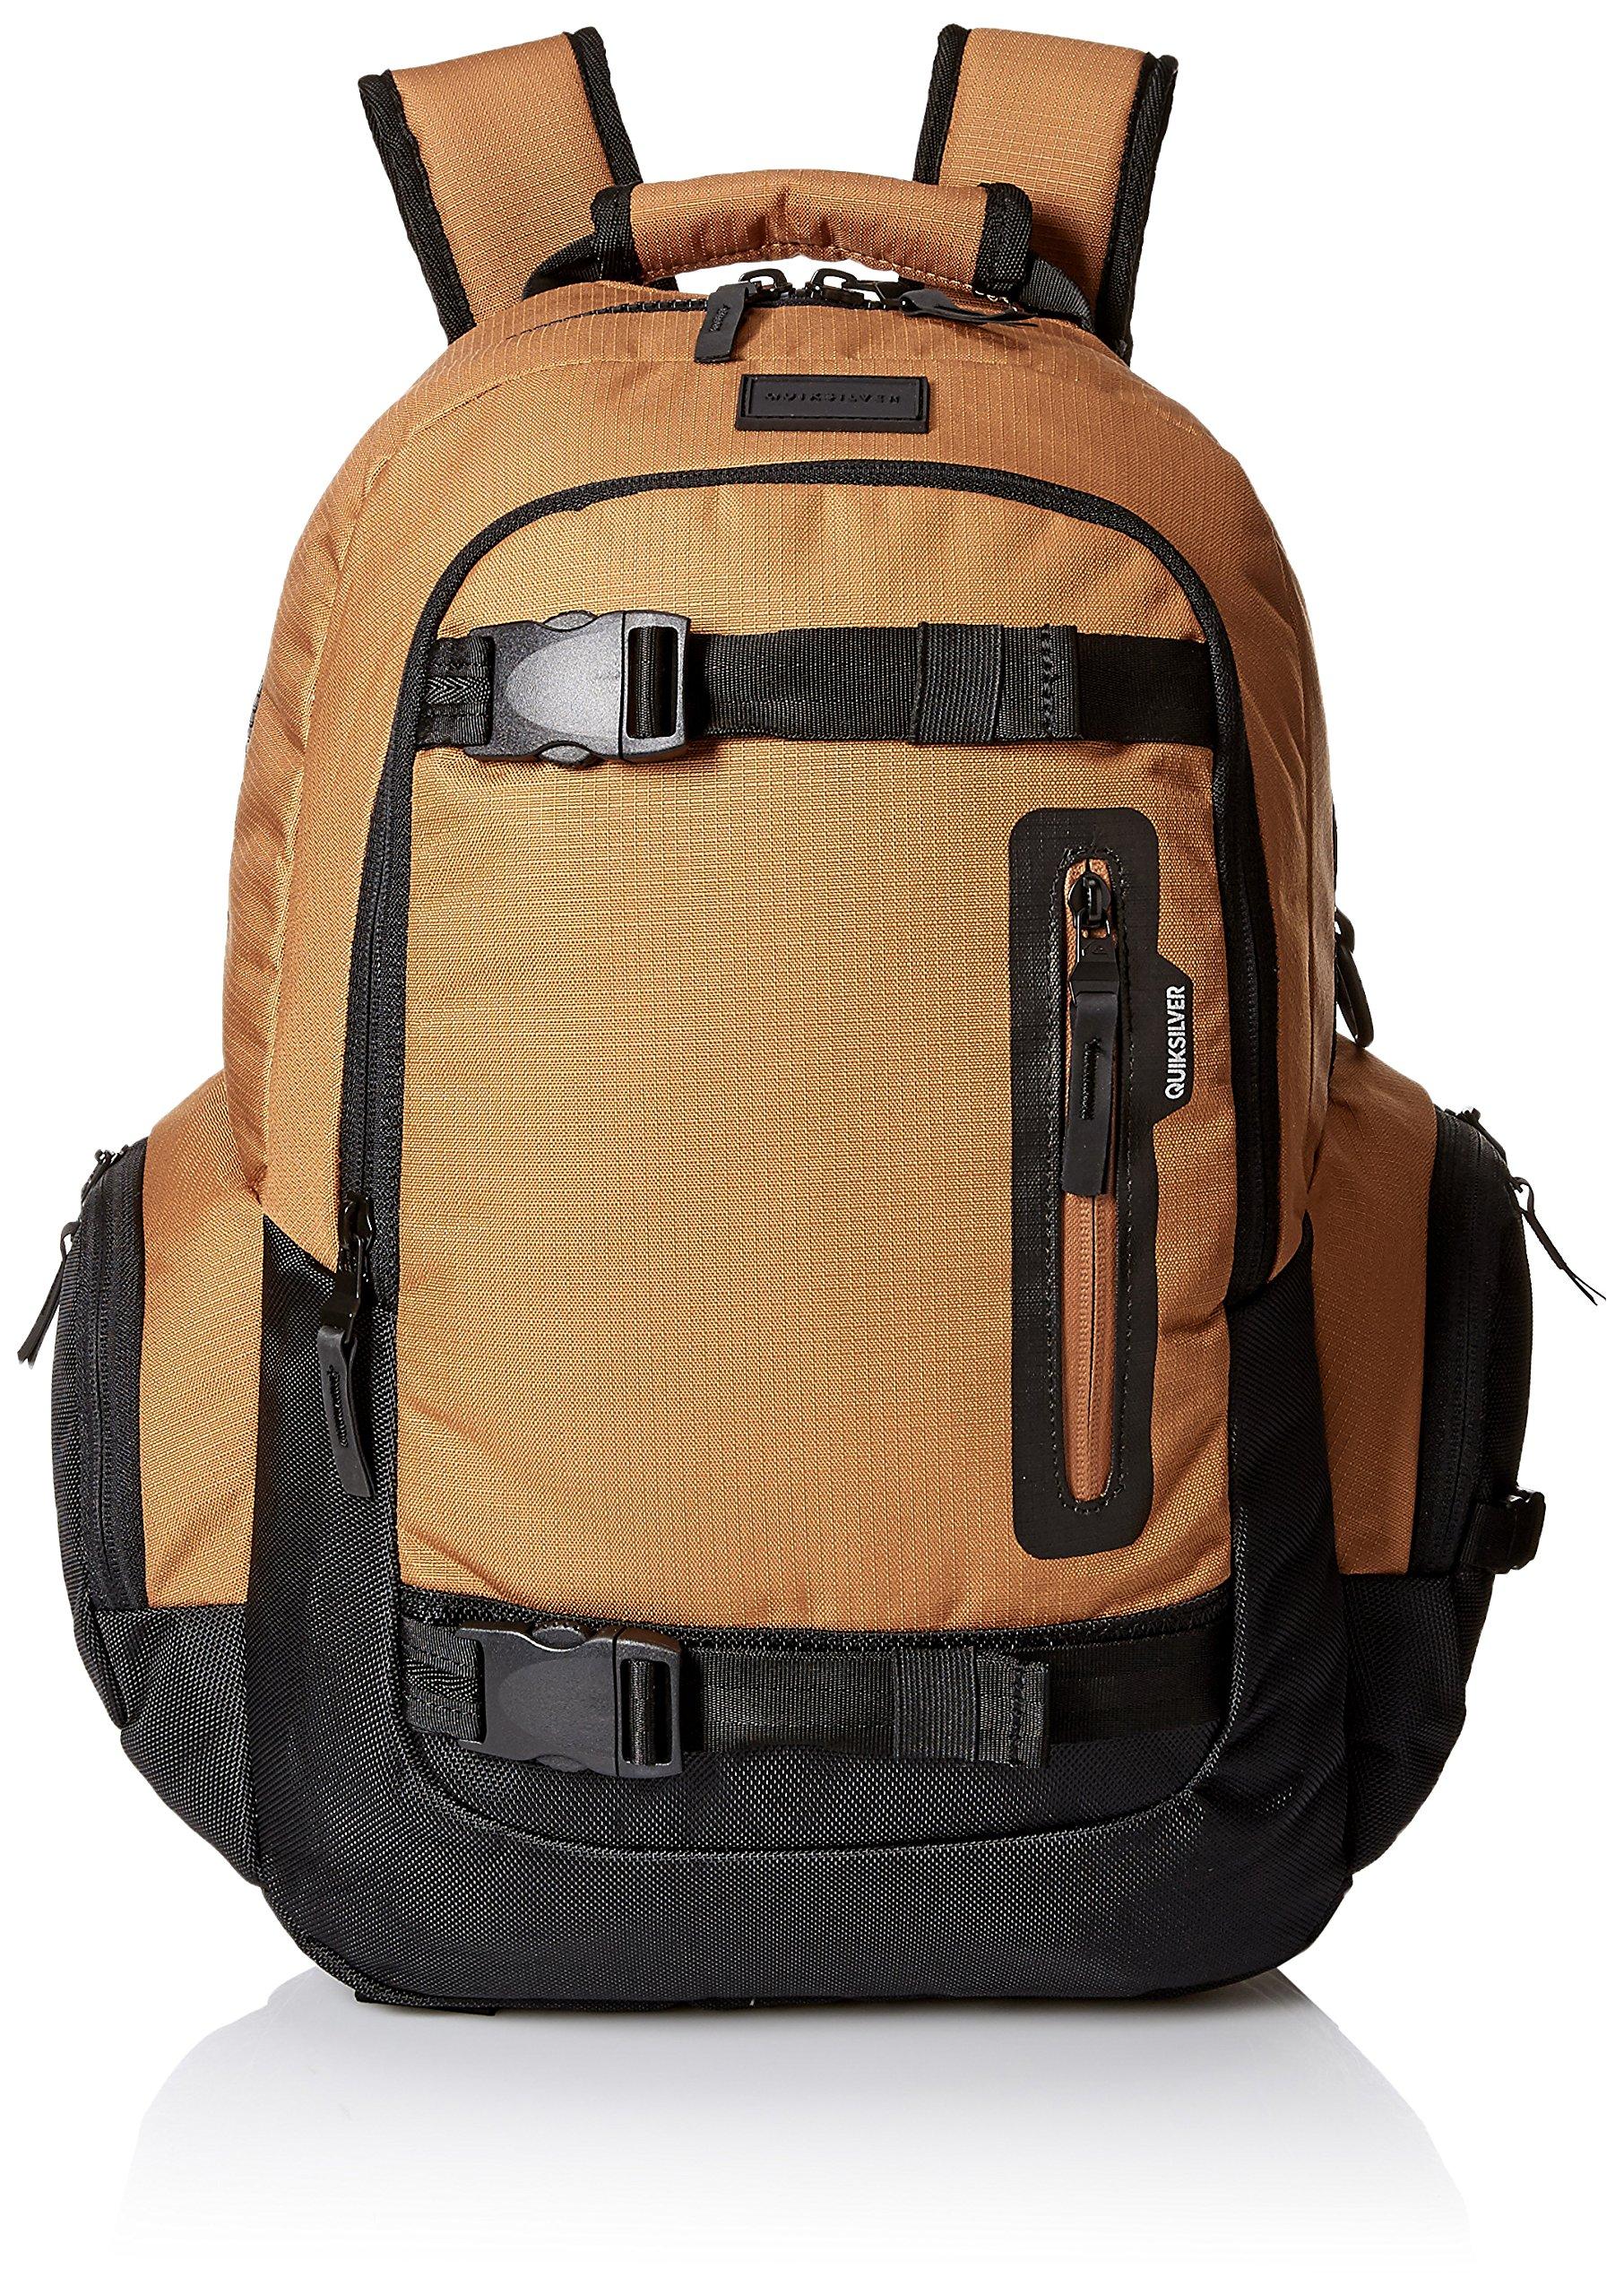 Quiksilver Men's Raker Backpack, Rubber by Quiksilver